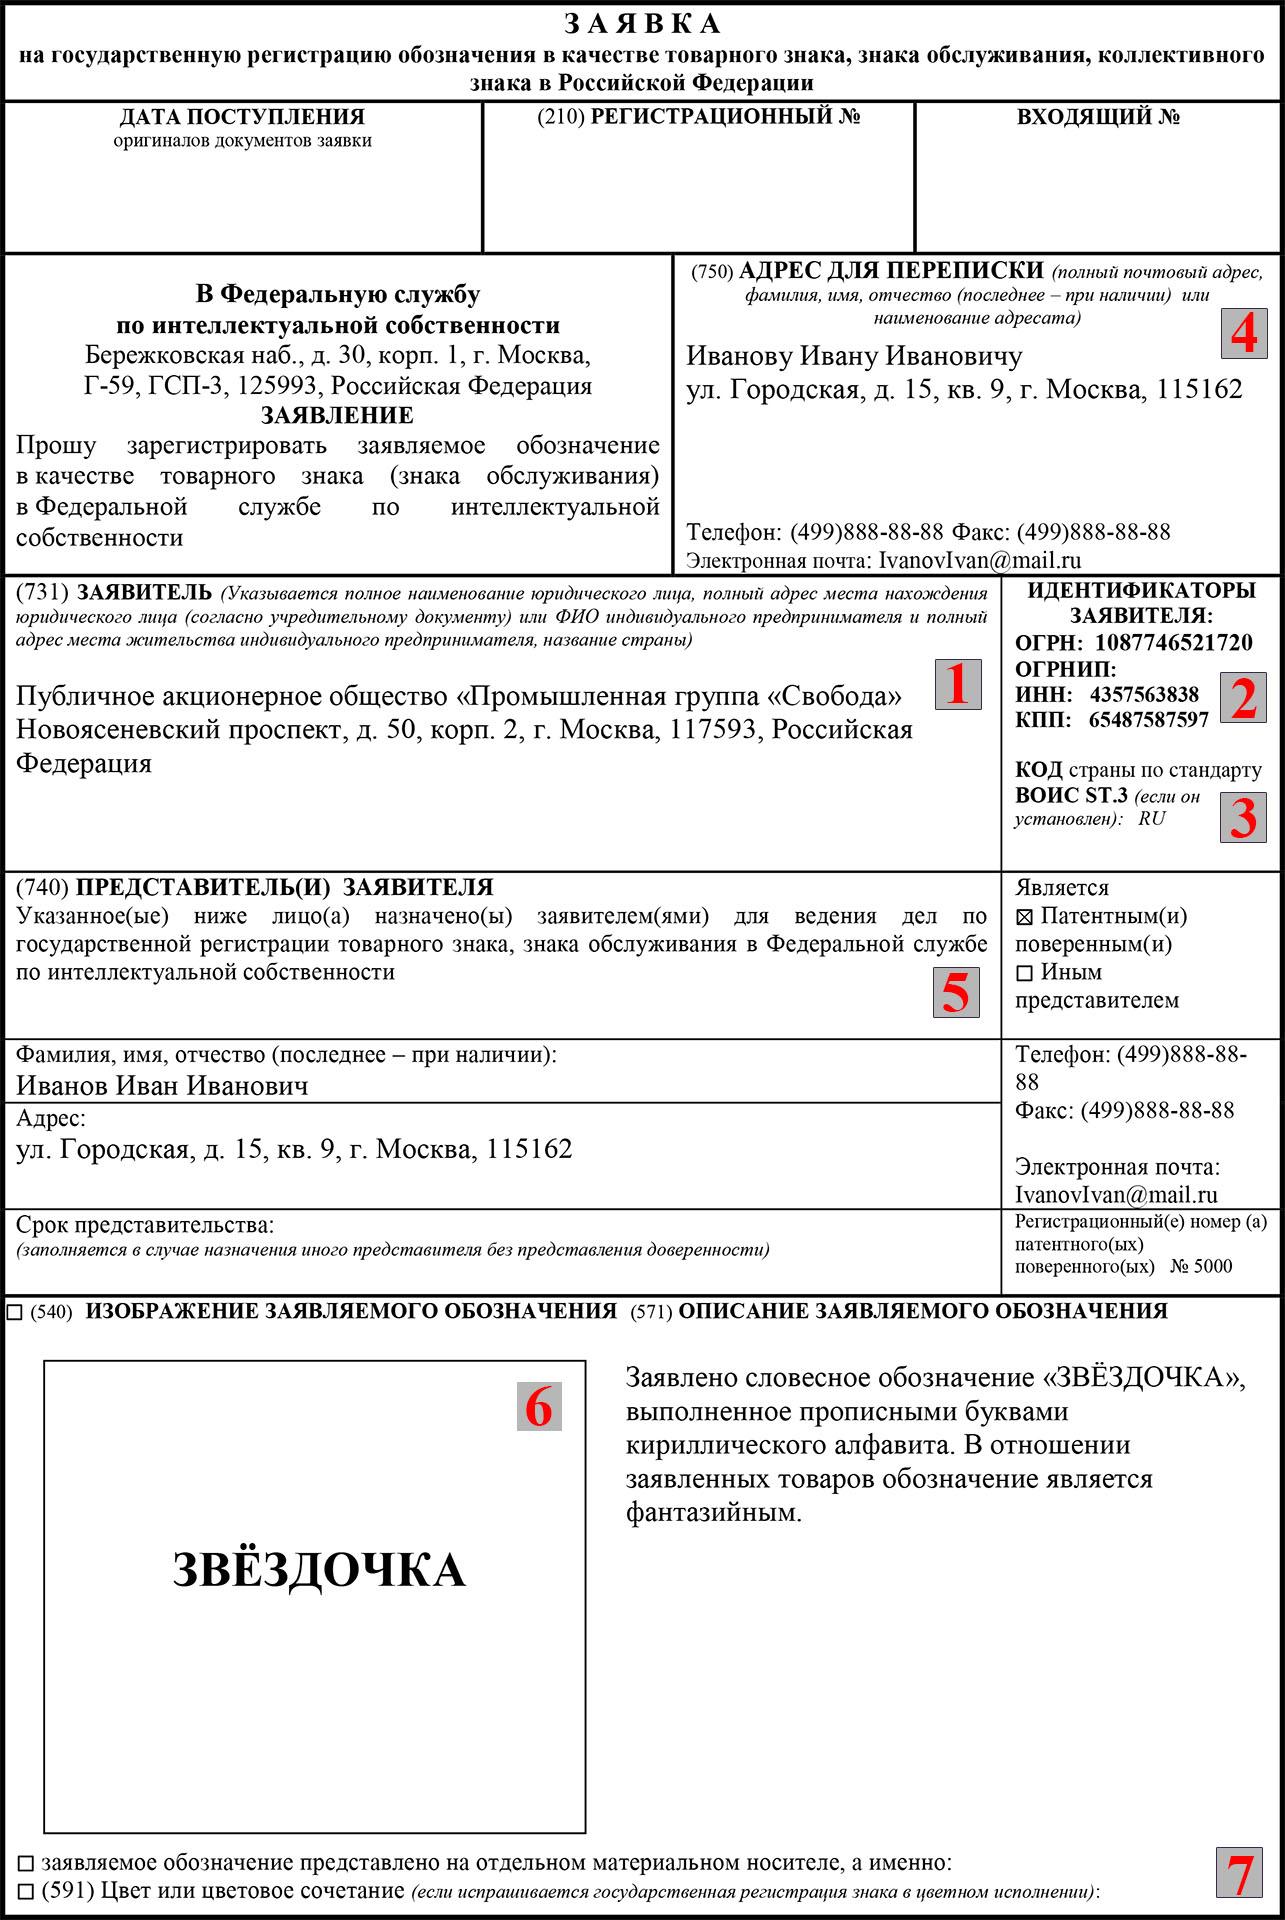 заявка на составление проекта договора